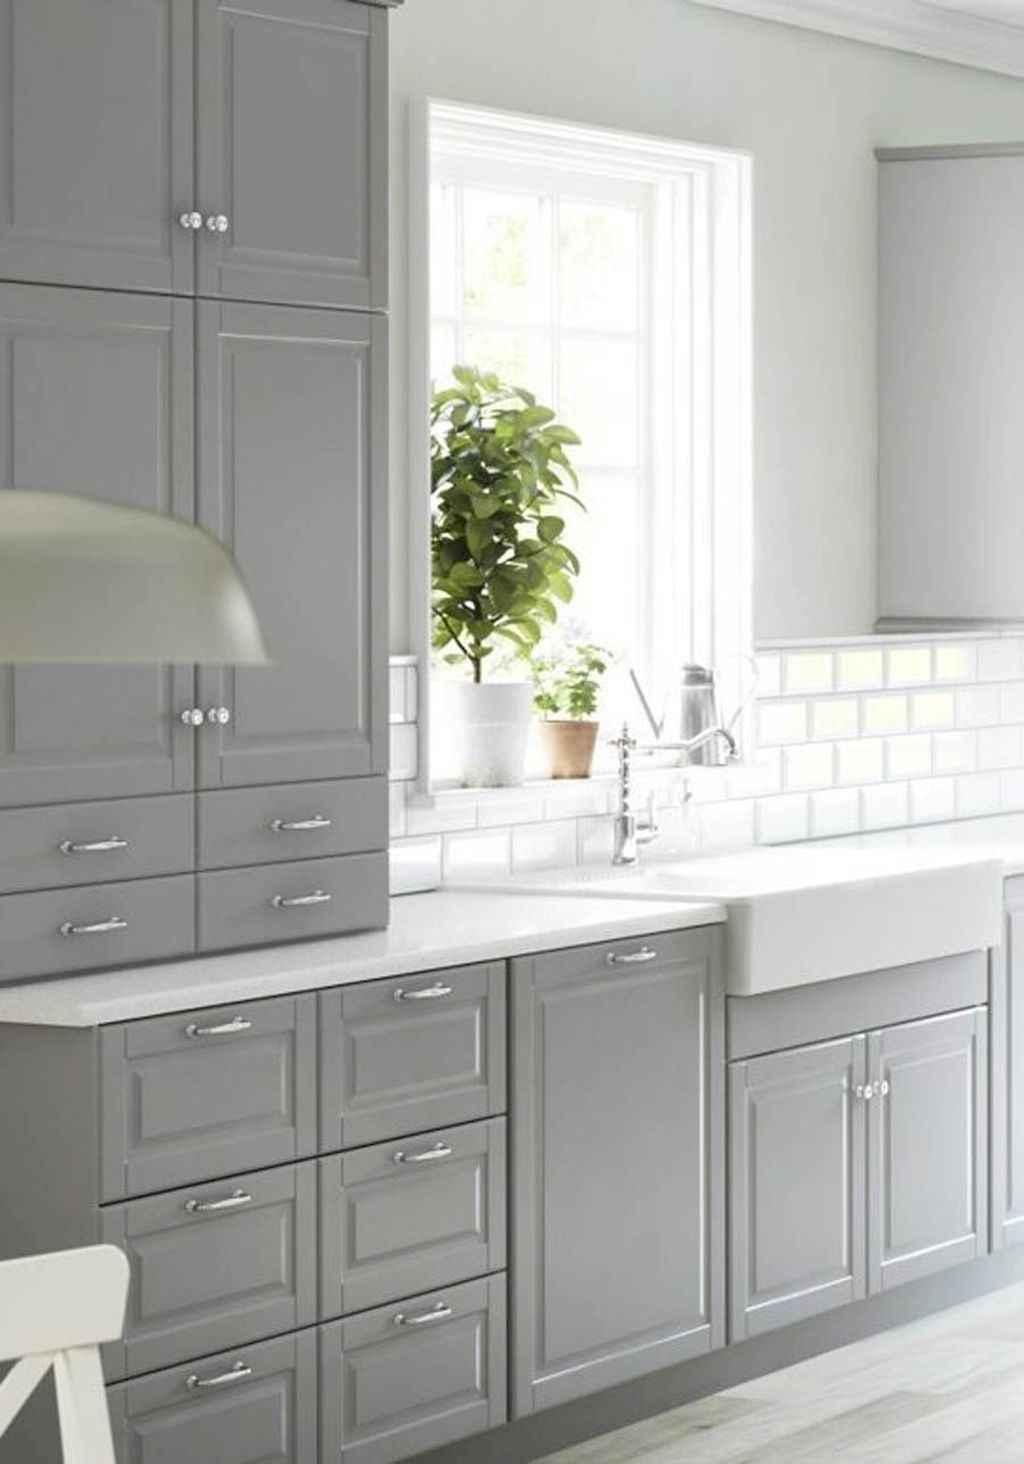 Gorgeous gray kitchen cabinet makeover ideas (25)